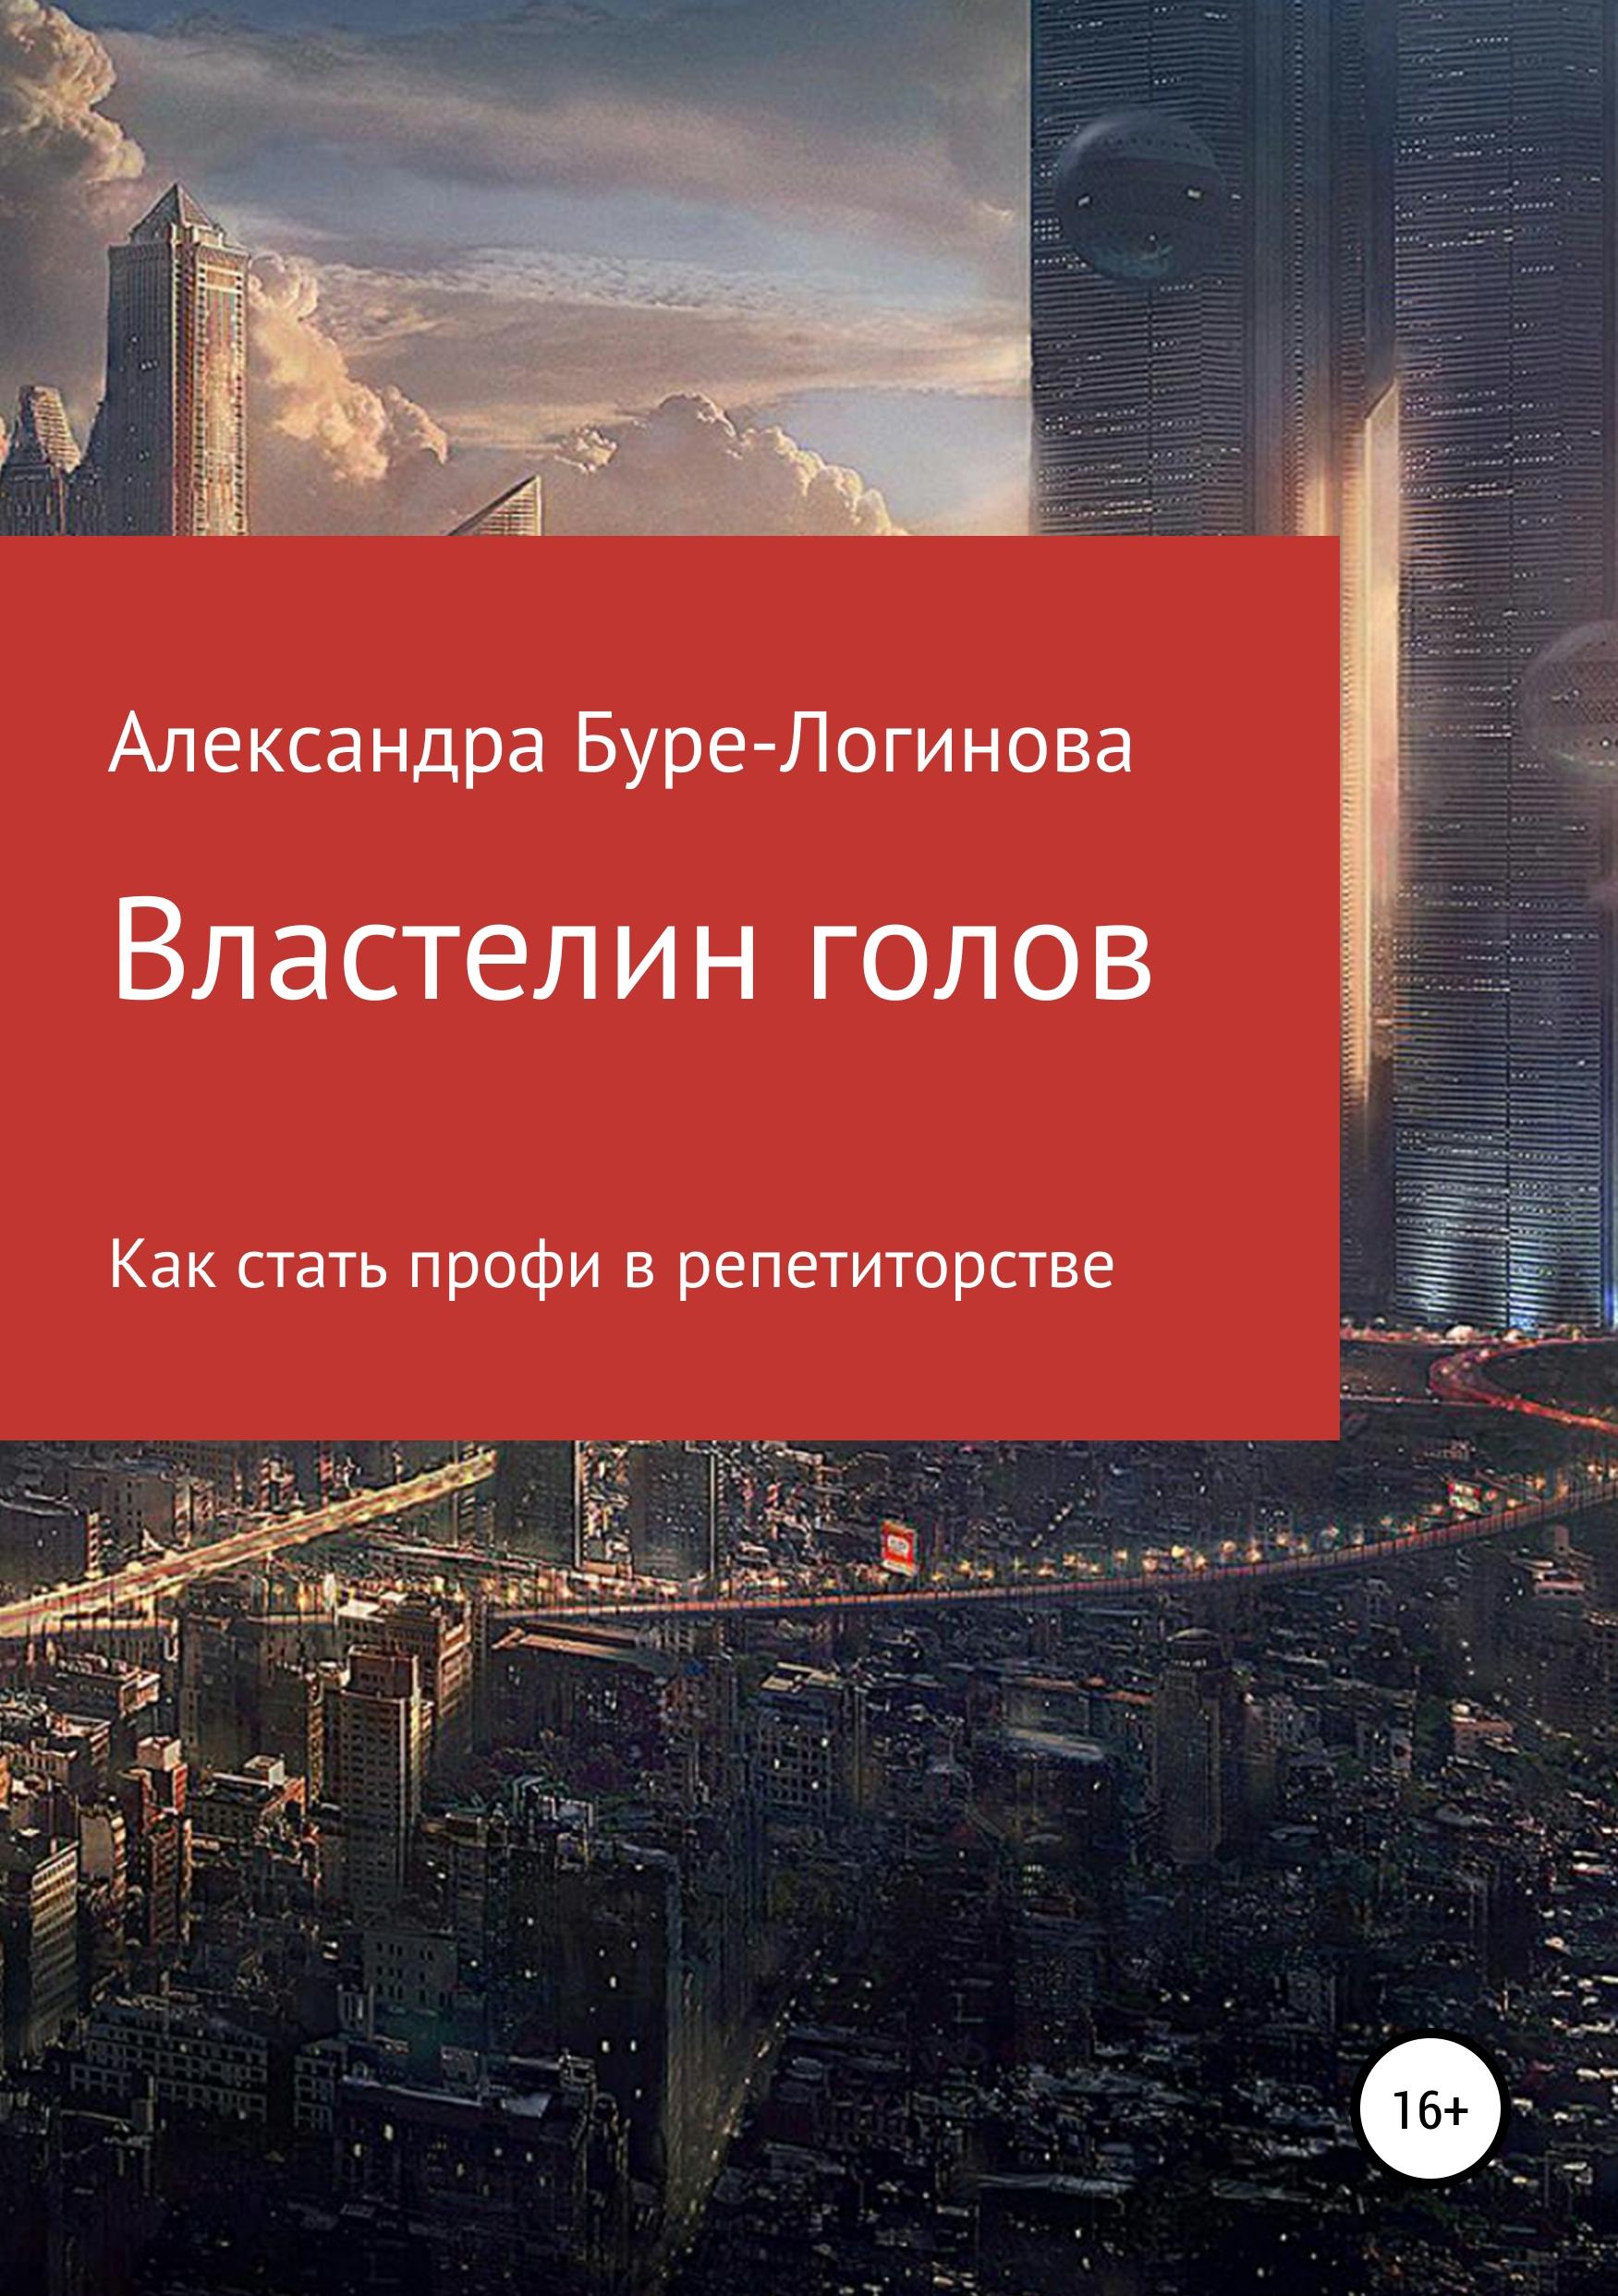 Александра Буре-Логинова Властелин голов